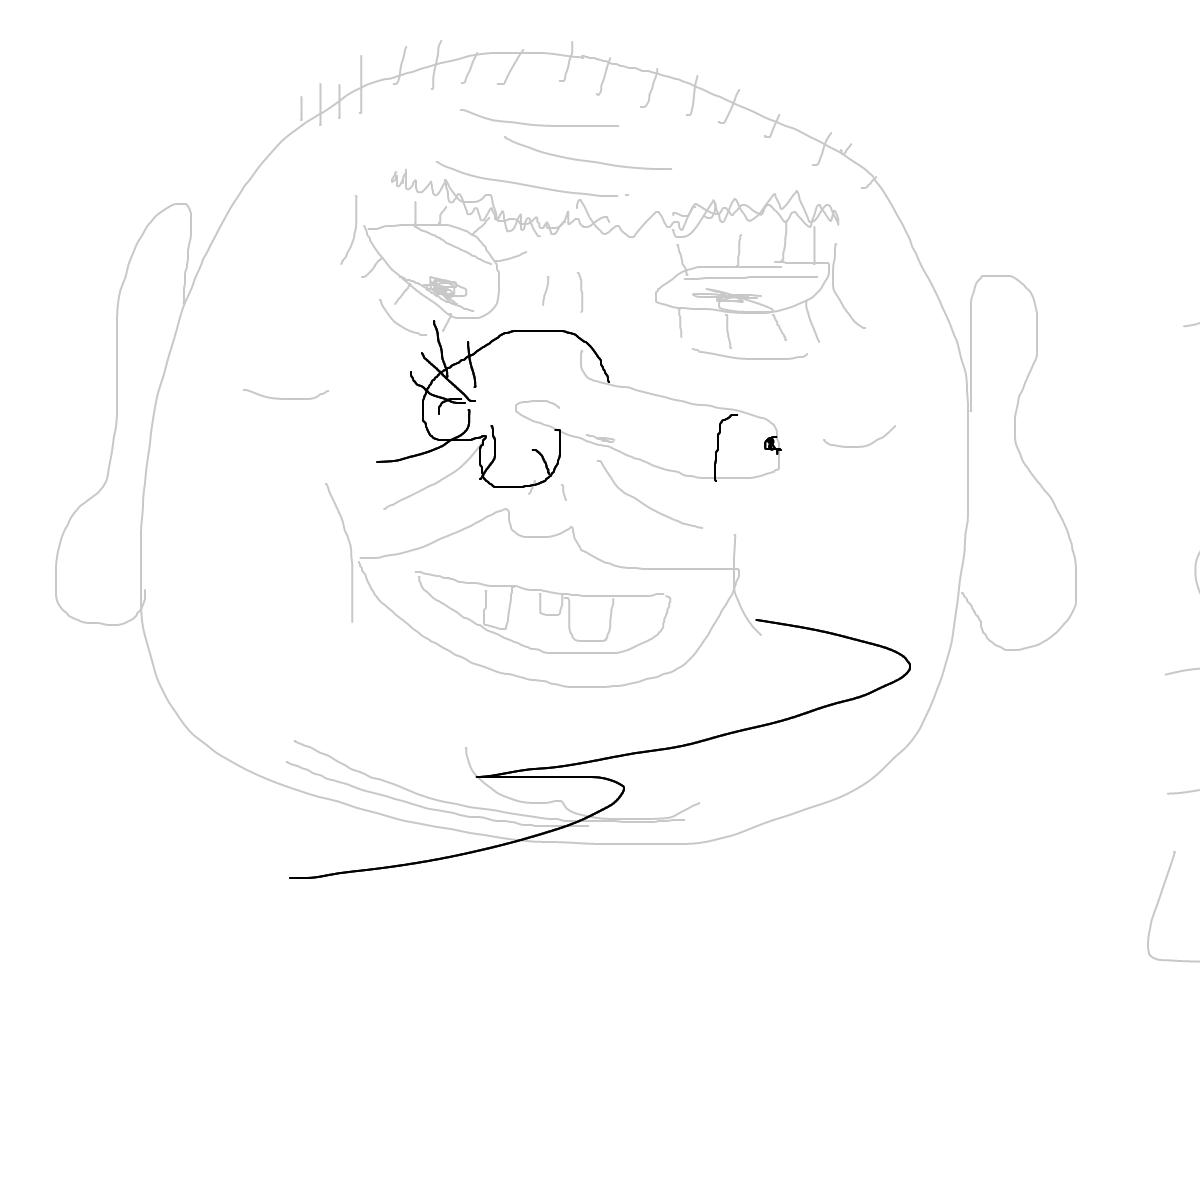 BAAAM drawing#11470 lat:52.4754447937011700lng: 13.4070158004760740